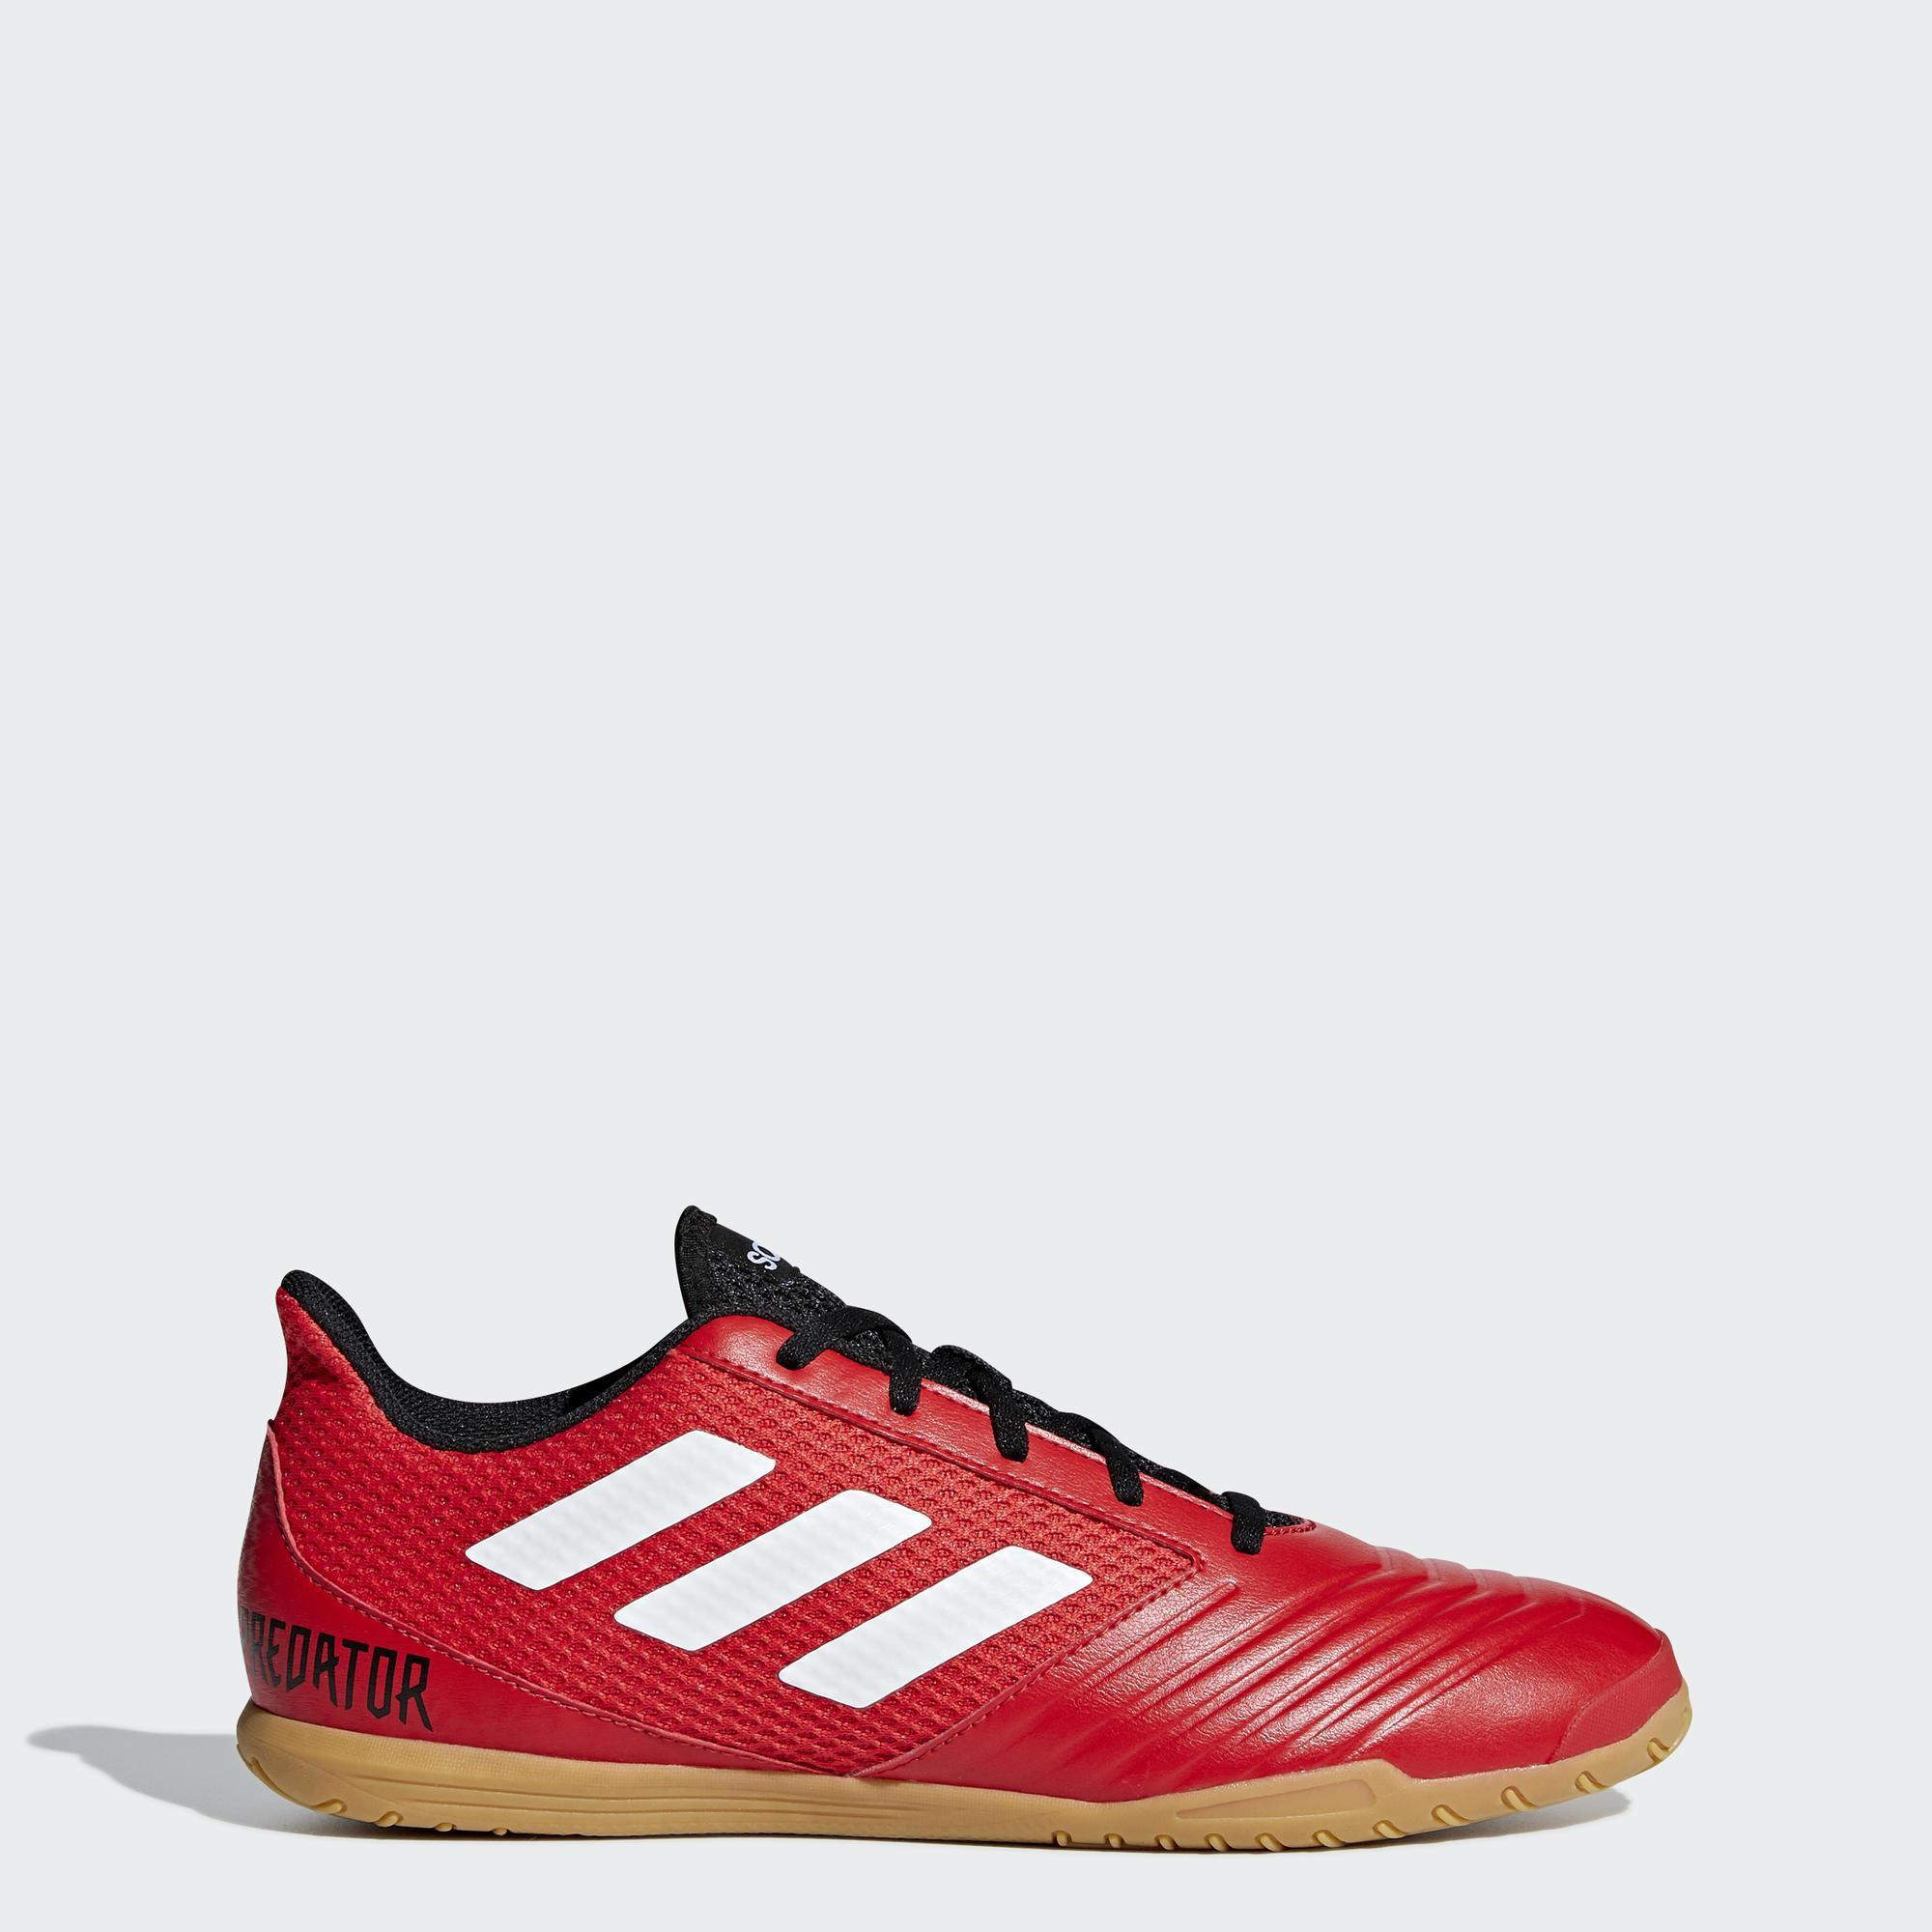 Adidas Zaalvoetbalschoenen Predator Tango 4 HW18